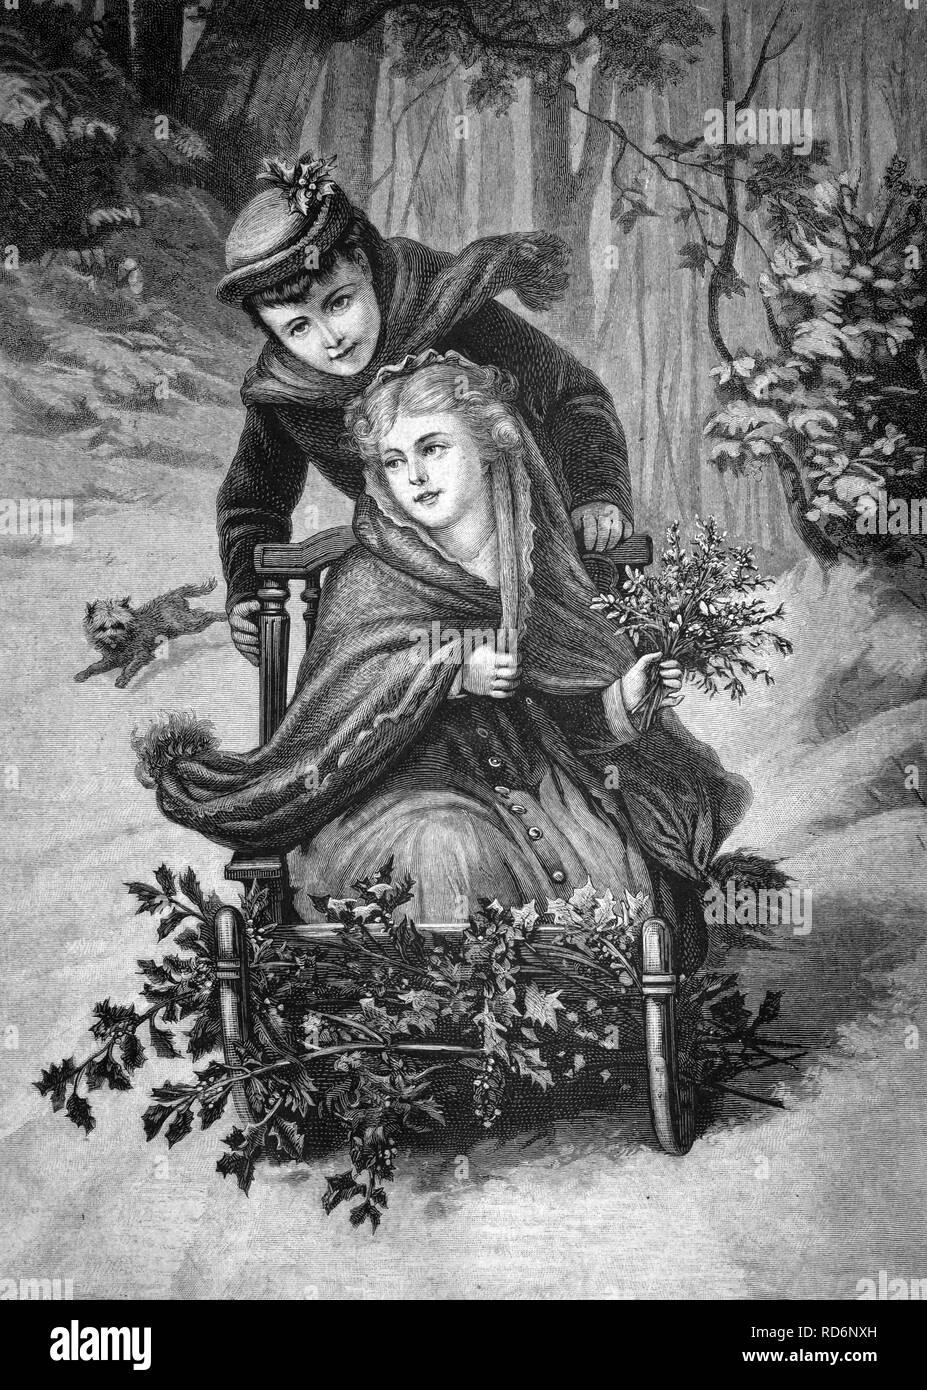 Winter pleasures, historical illustration, about 1886 Stock Photo